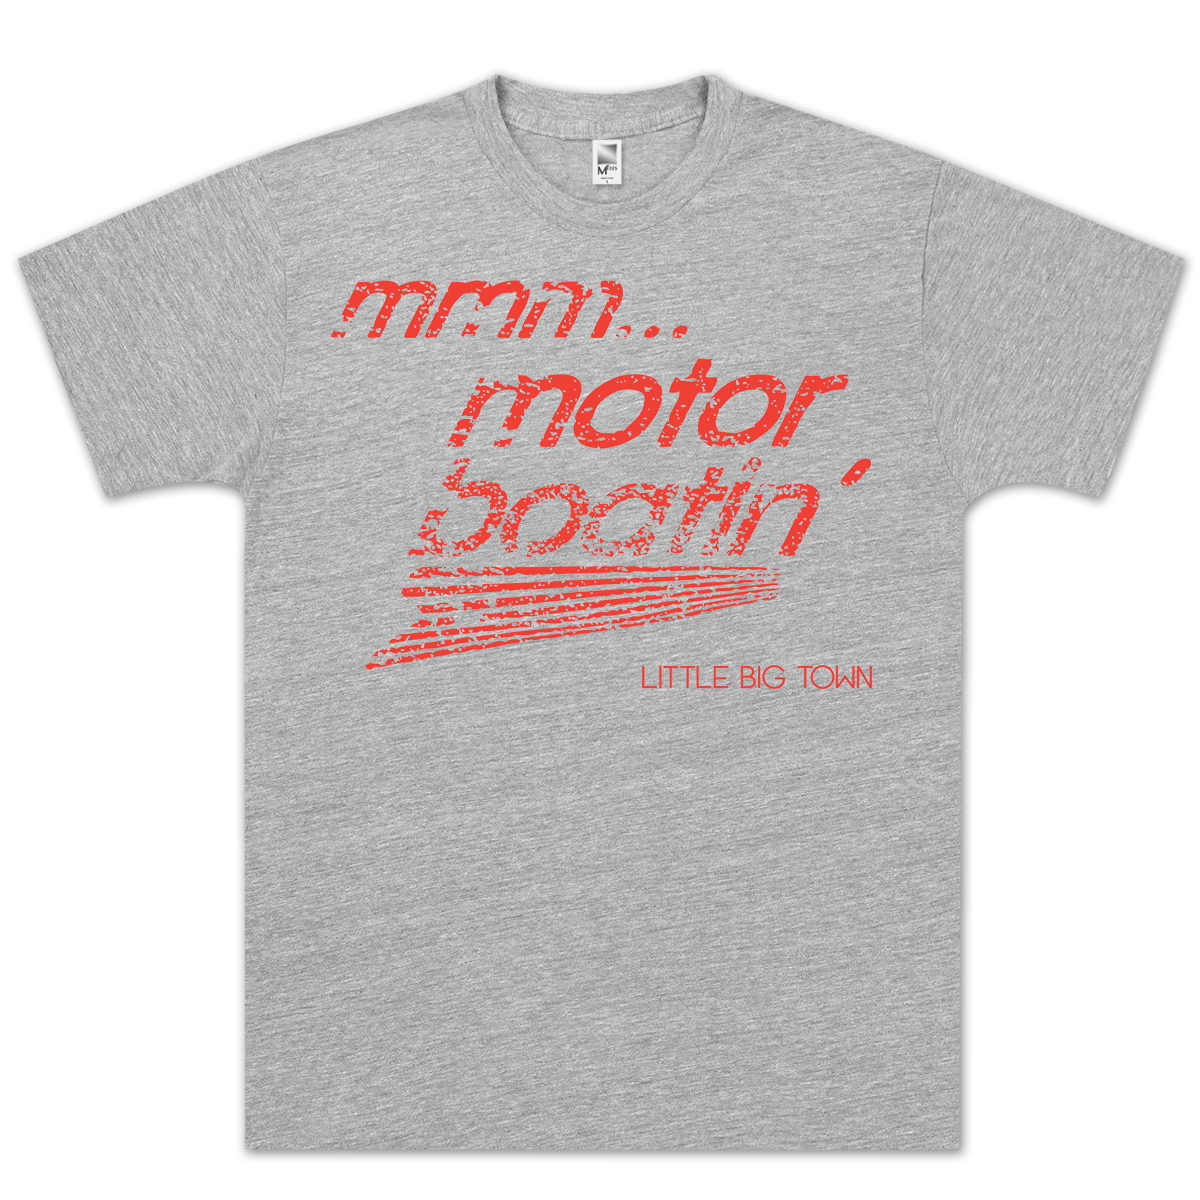 LBT MMM Motoboatin' T-Shirt